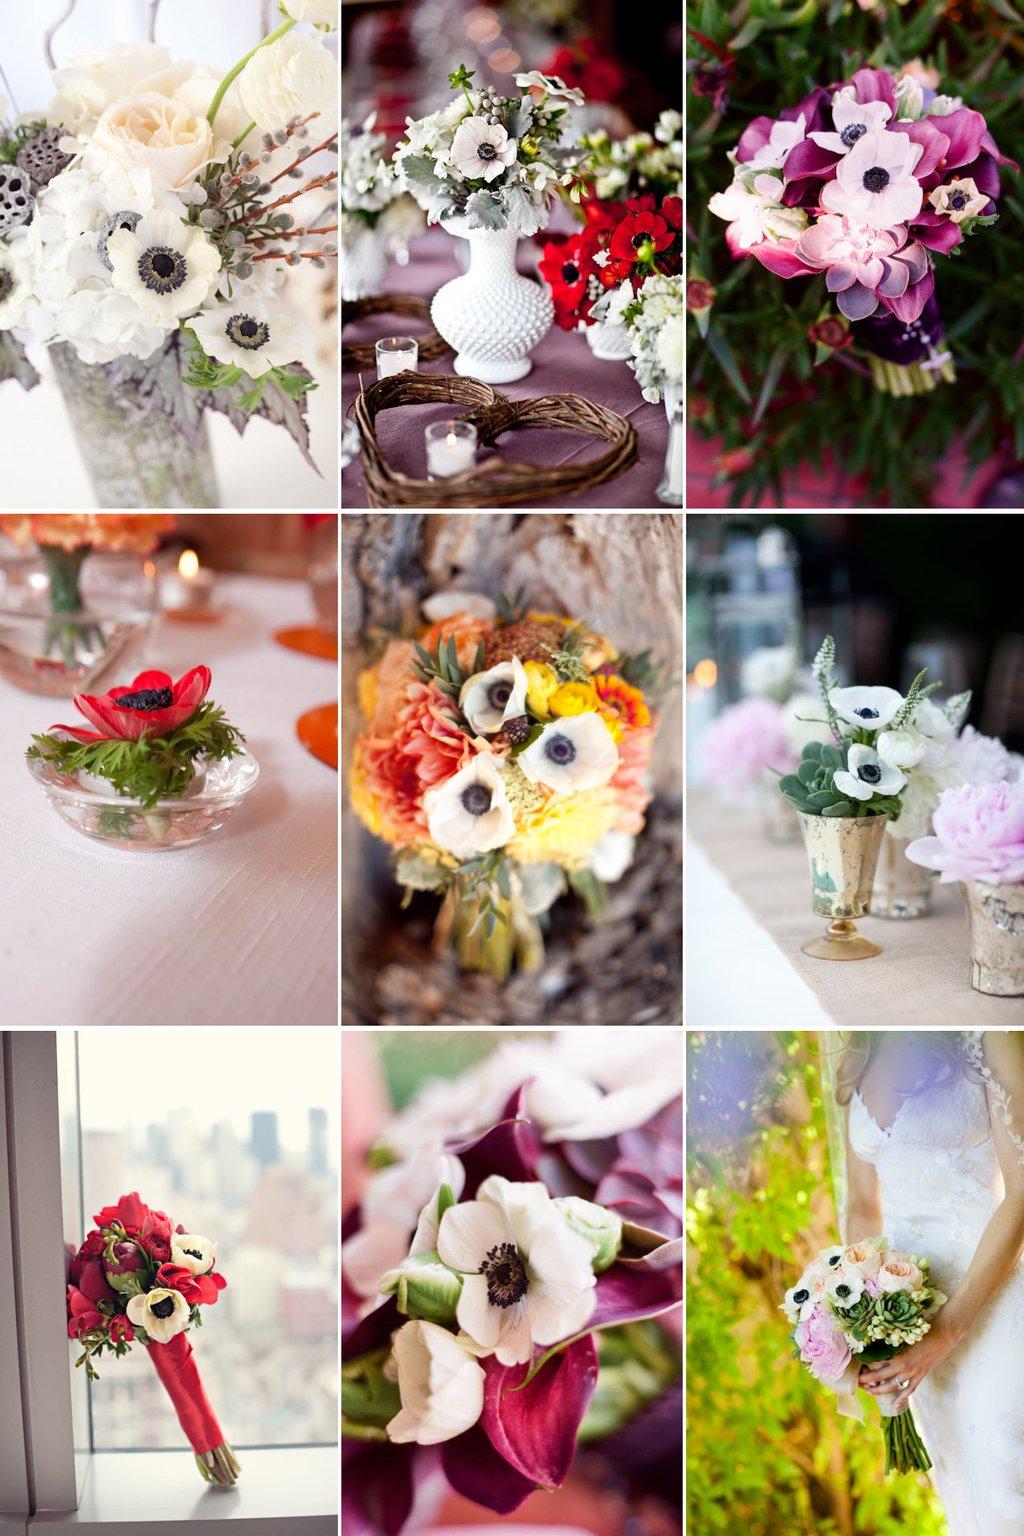 Wedding-flower-ideas-anemone-bridal-bouquets-centerpieces.full